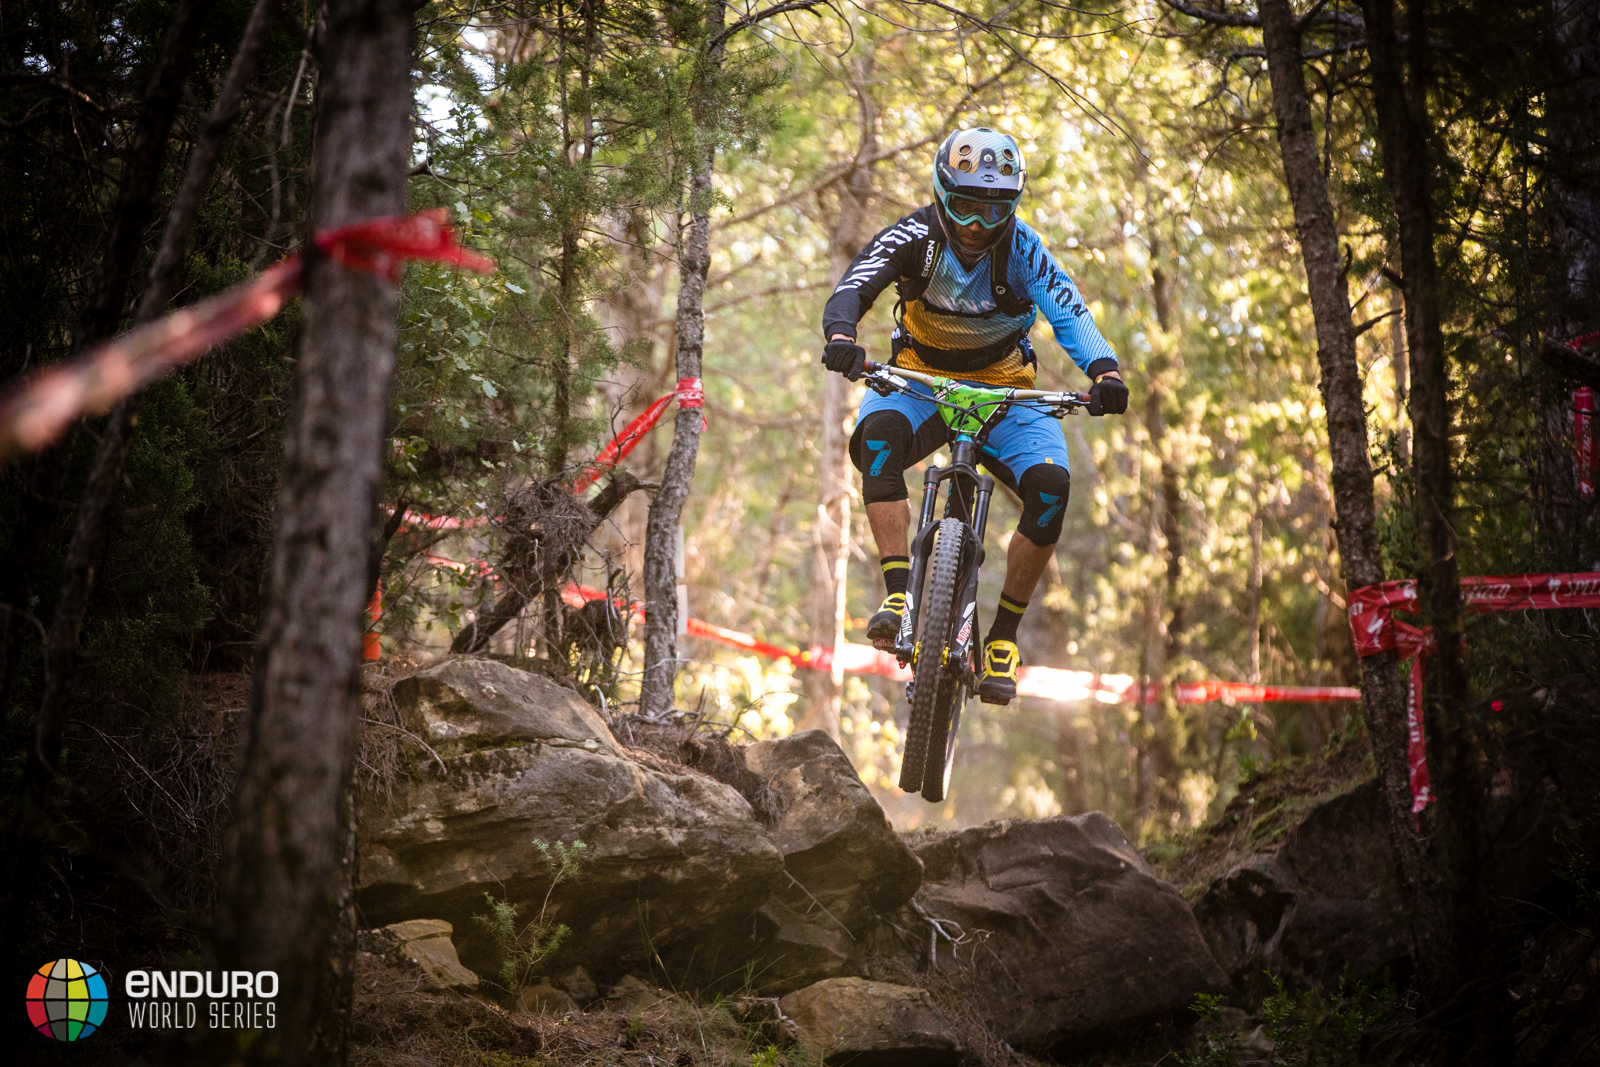 Fabien Barel in stage six. EWS round 7, Ainsa, Spain. Photo by Matt Wragg.